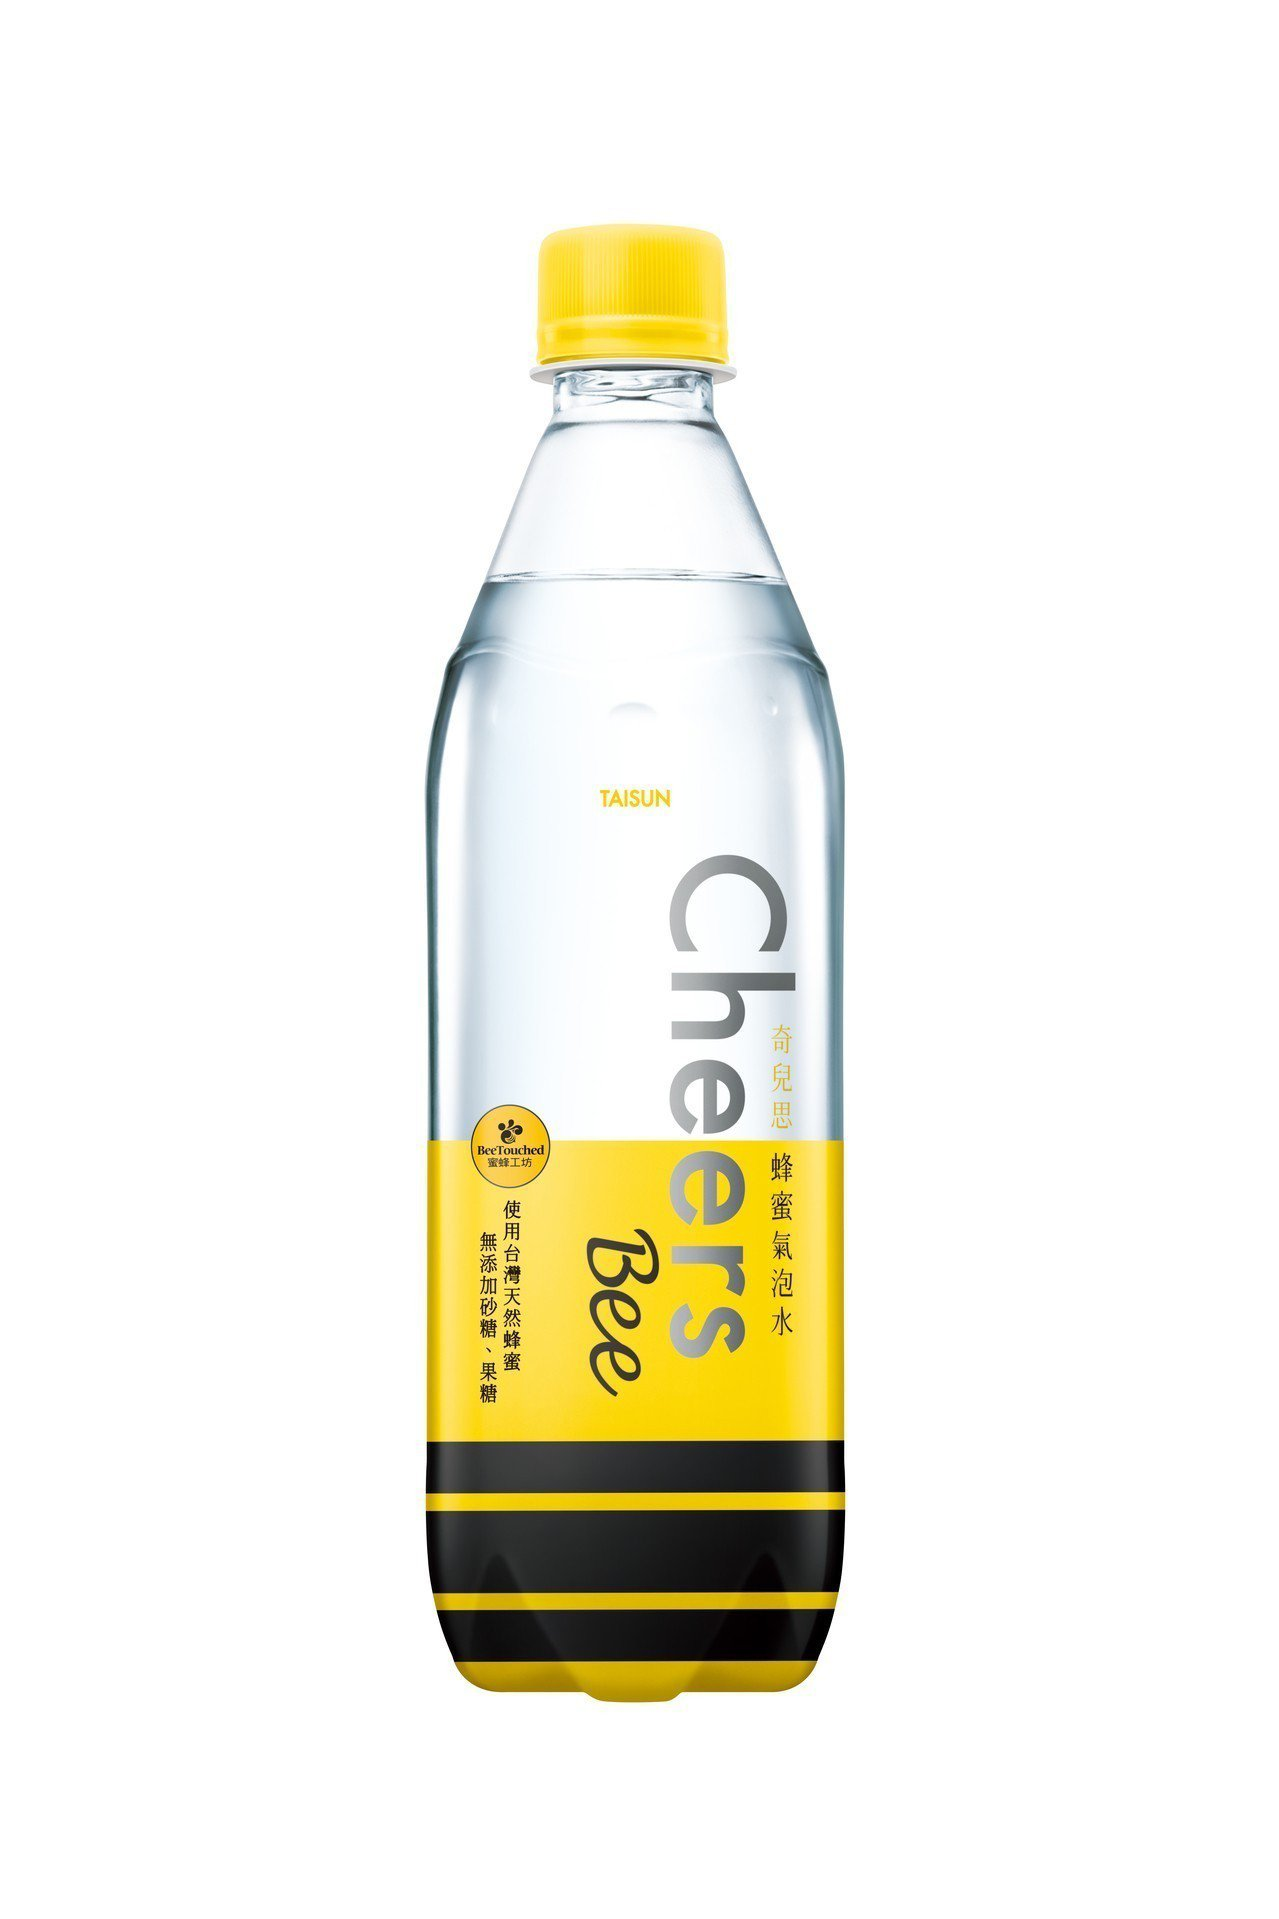 Cheers蜂蜜氣泡水,添加蜜蜂工坊的台灣天然蜂蜜。圖/泰山提供